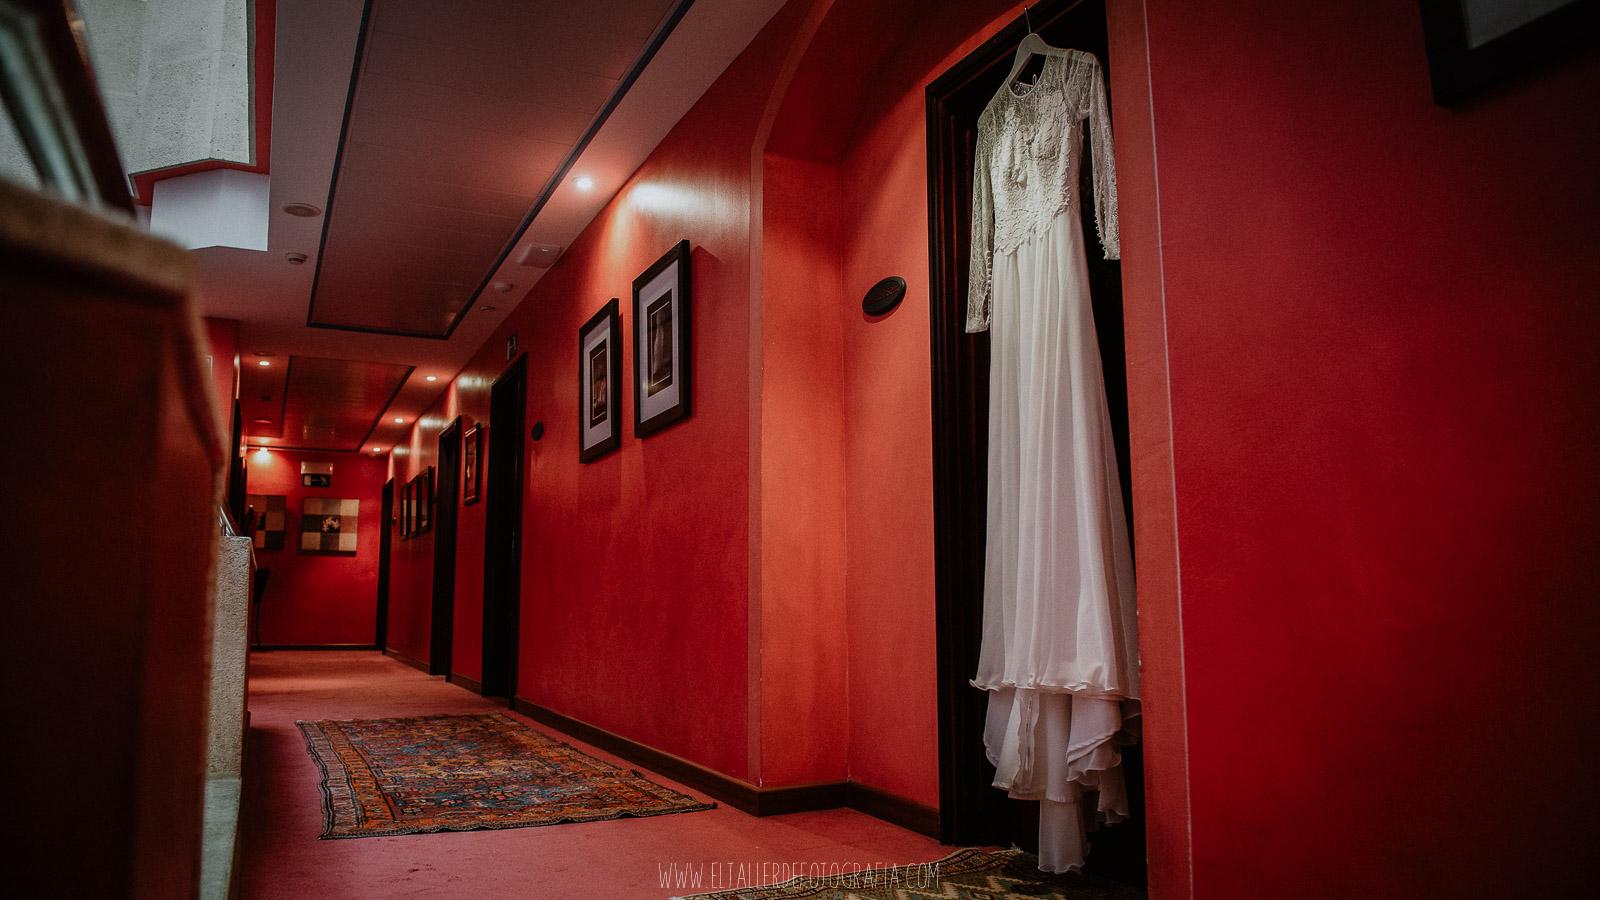 Vestido de la novia colgado en la puerta de la habitacion